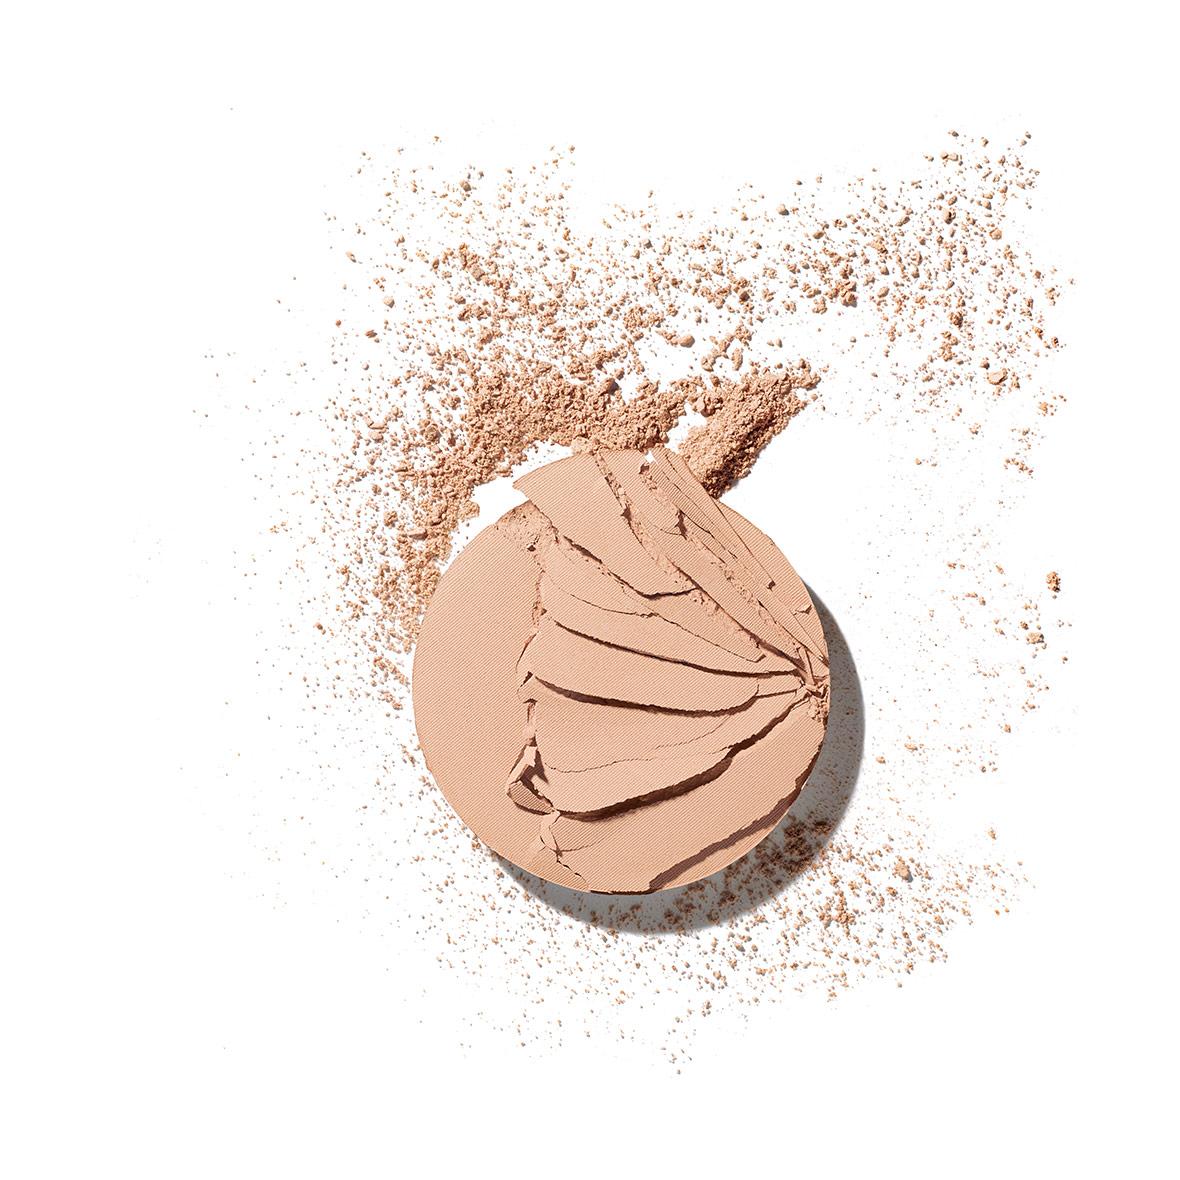 La Roche-Posay UVIDEA XL 每日高效隔離系列系列的UVIDEA輕柔透亮低敏防曬粉餅 $290 產品圖片